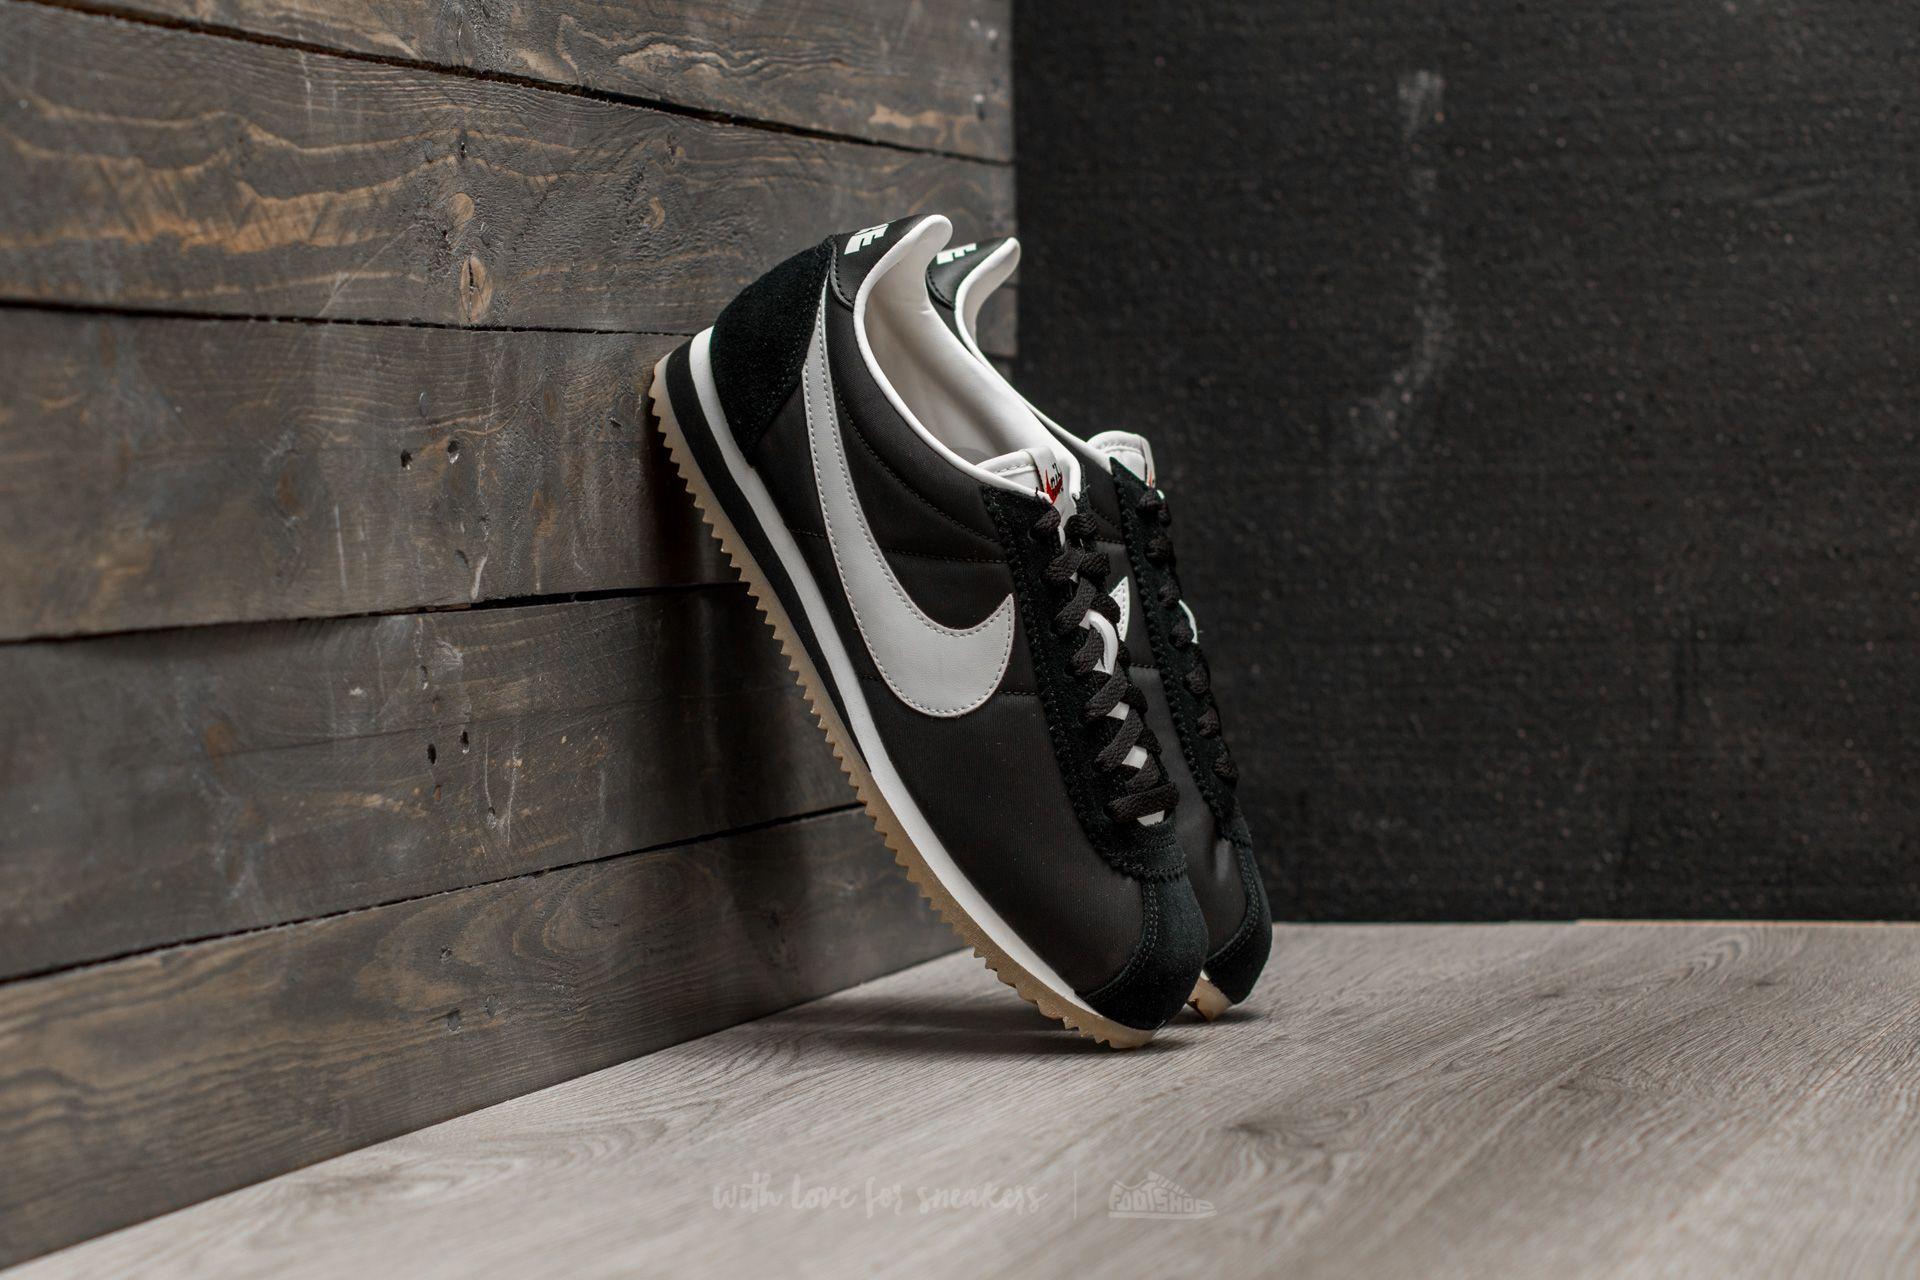 7d720ade4ab2 Nike Classic Cortez Nylon Premium Black  Sail-Gum Light Brown ...